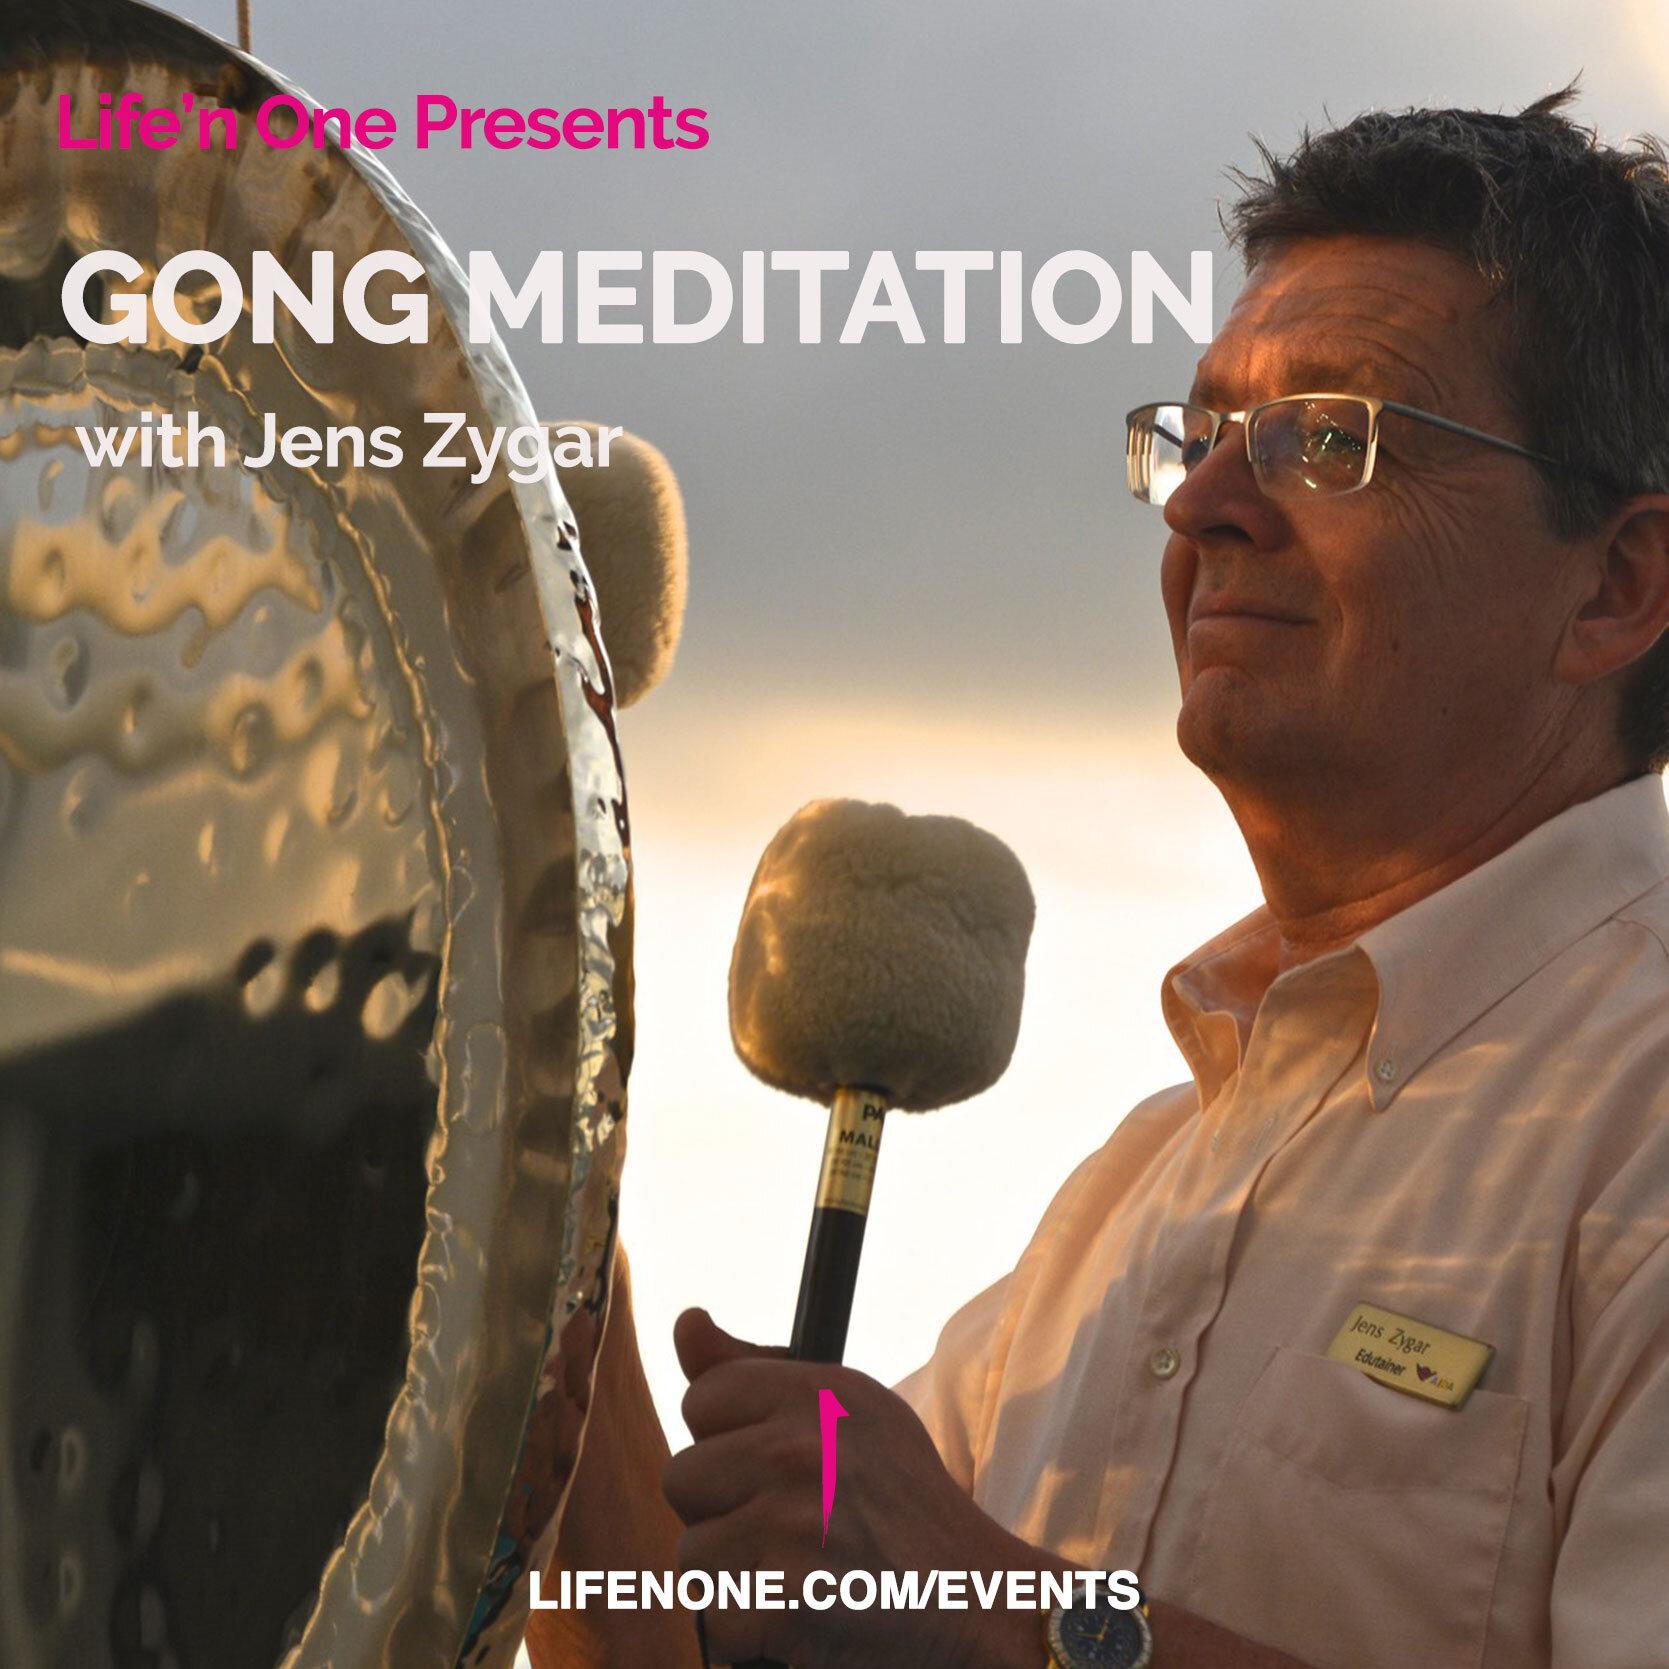 191101-gong-meditation-with-Jens.jpg